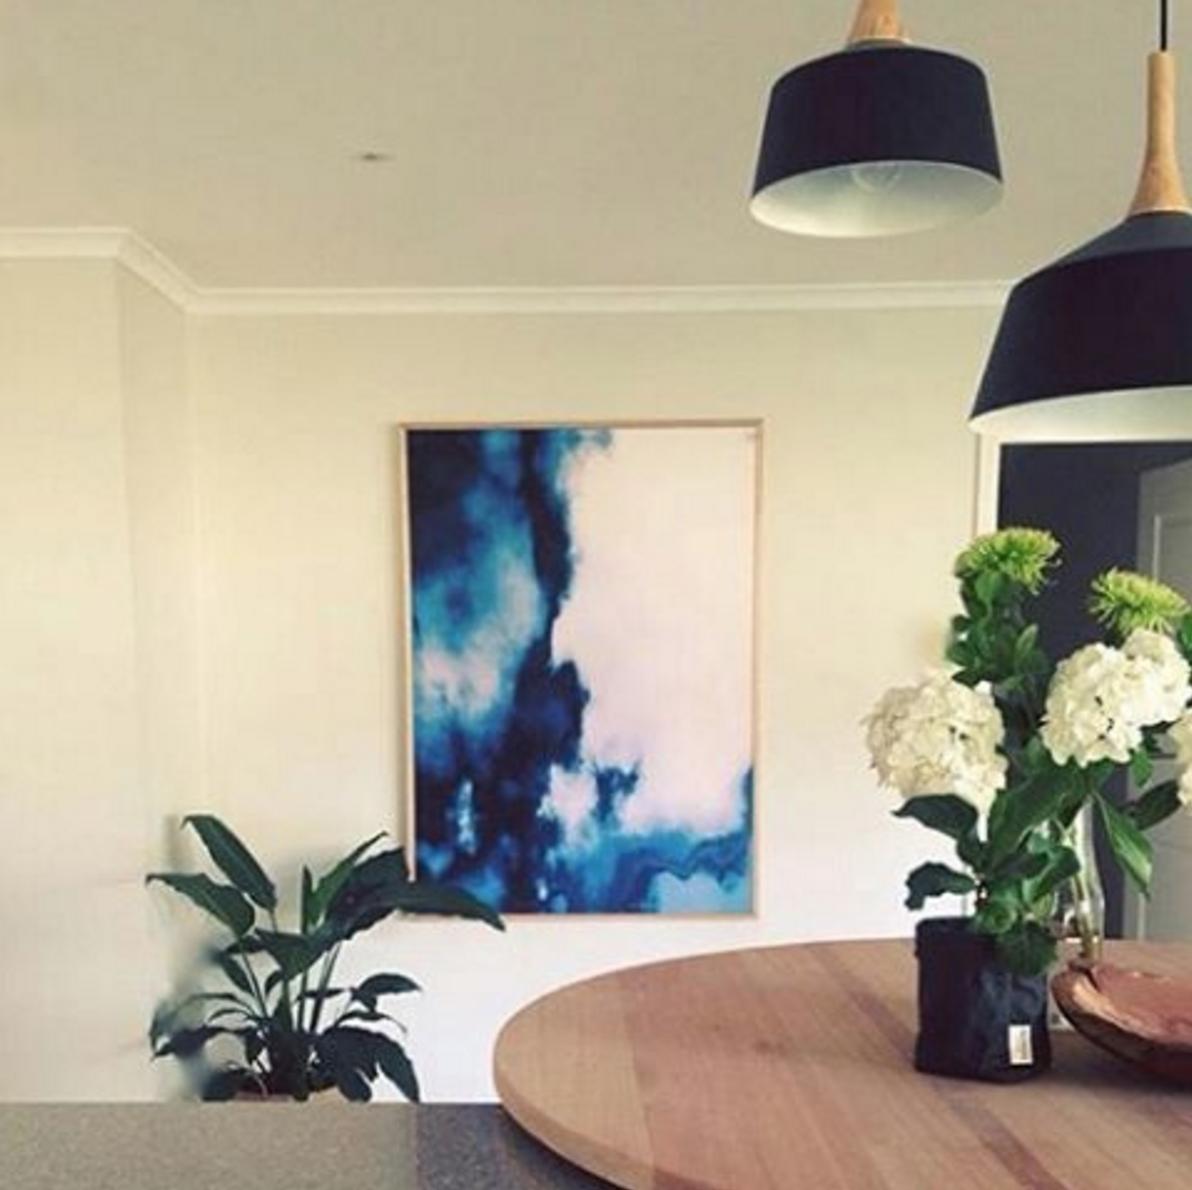 Our 'Blue Mist' canvas print in the beautiful home of our stylish customer Rachael.  http://www.unitedartworks.net/artwork/alisa-lysandra/blue-mist-original-art